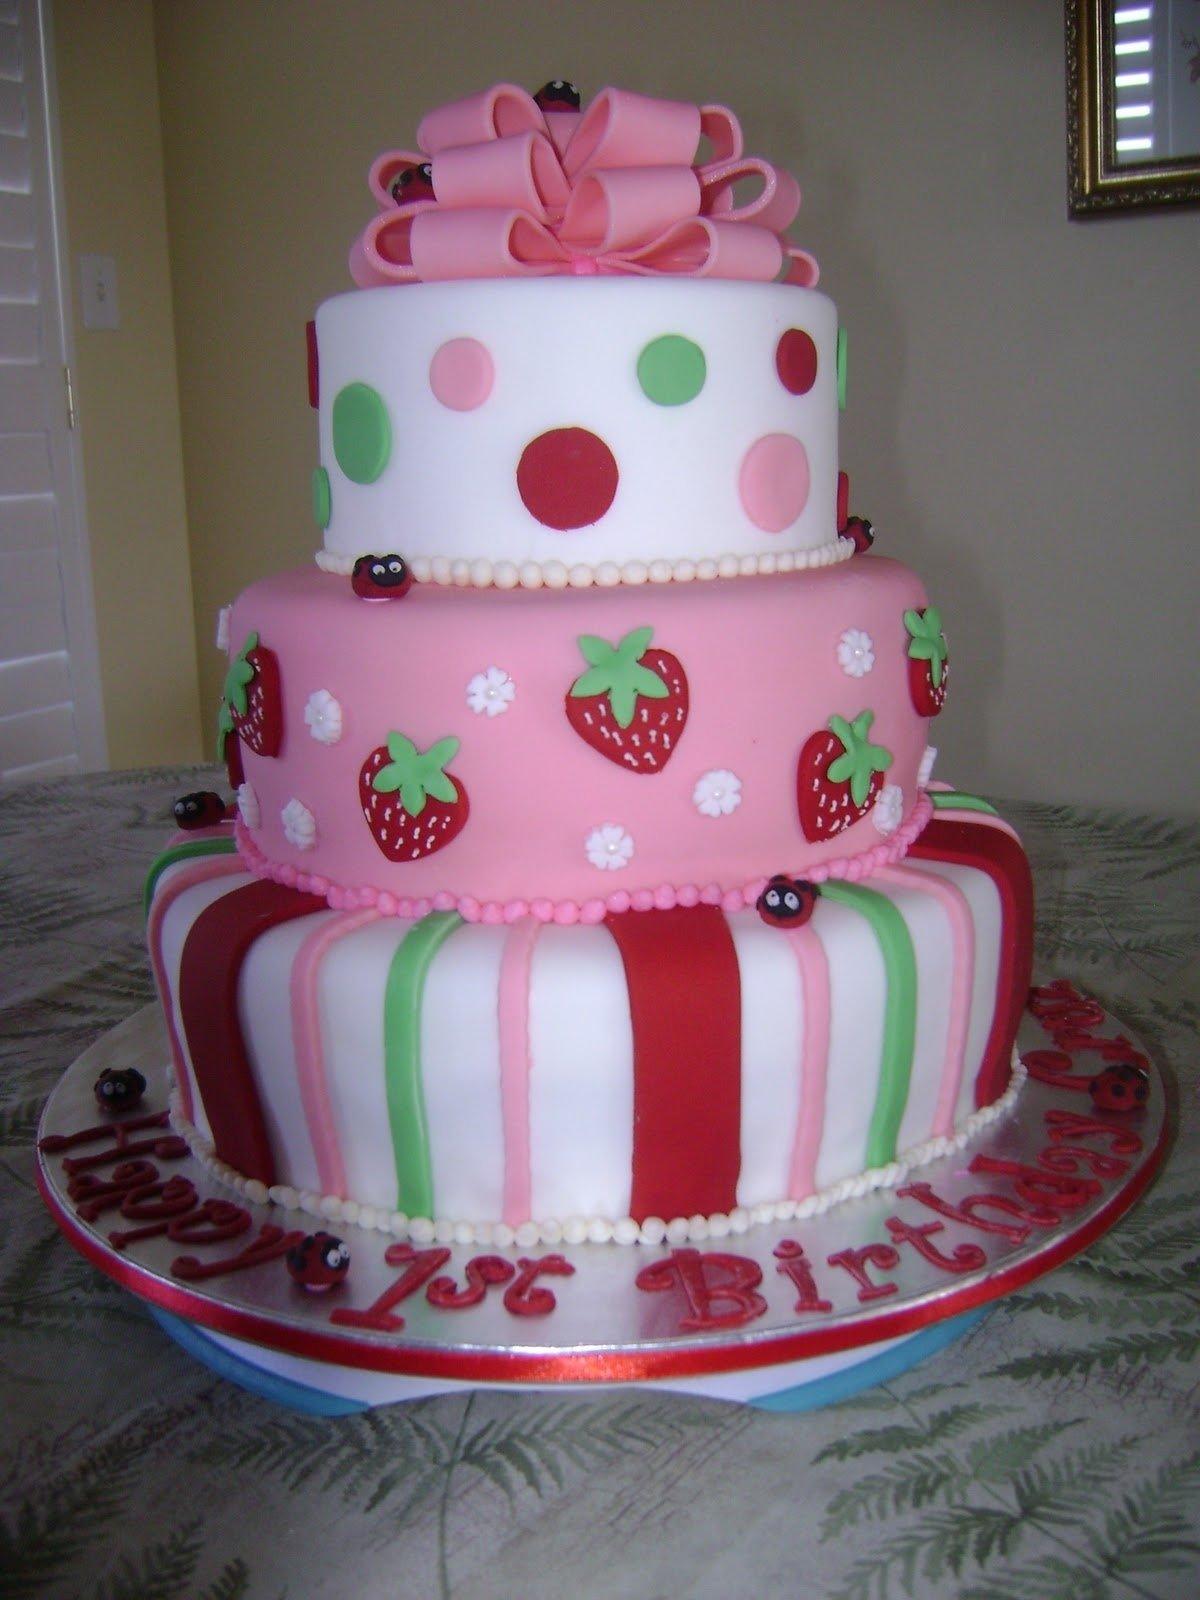 10 Attractive Strawberry Shortcake Birthday Cake Ideas strawberry shortcake birthday cake recipe cbertha fashion pertaining 2020